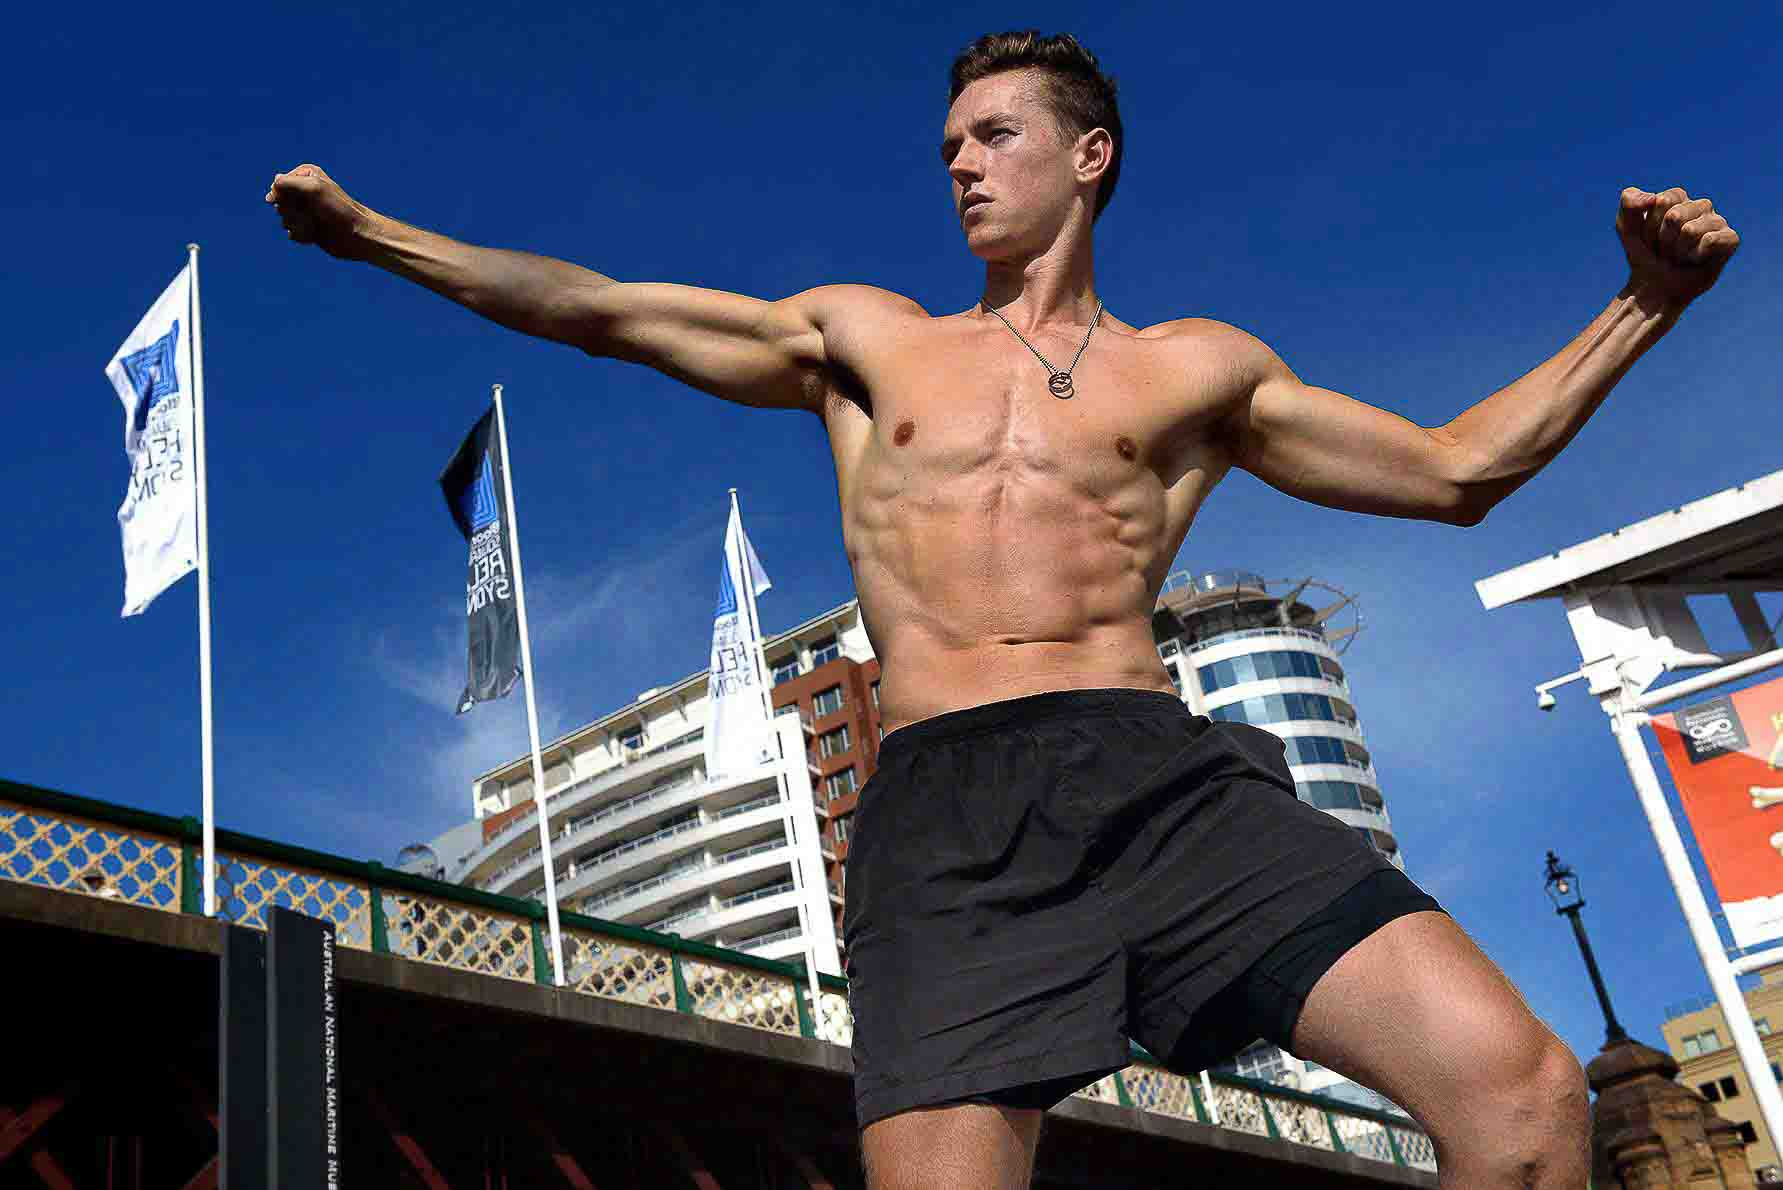 Jake Sydneys young male fitness model